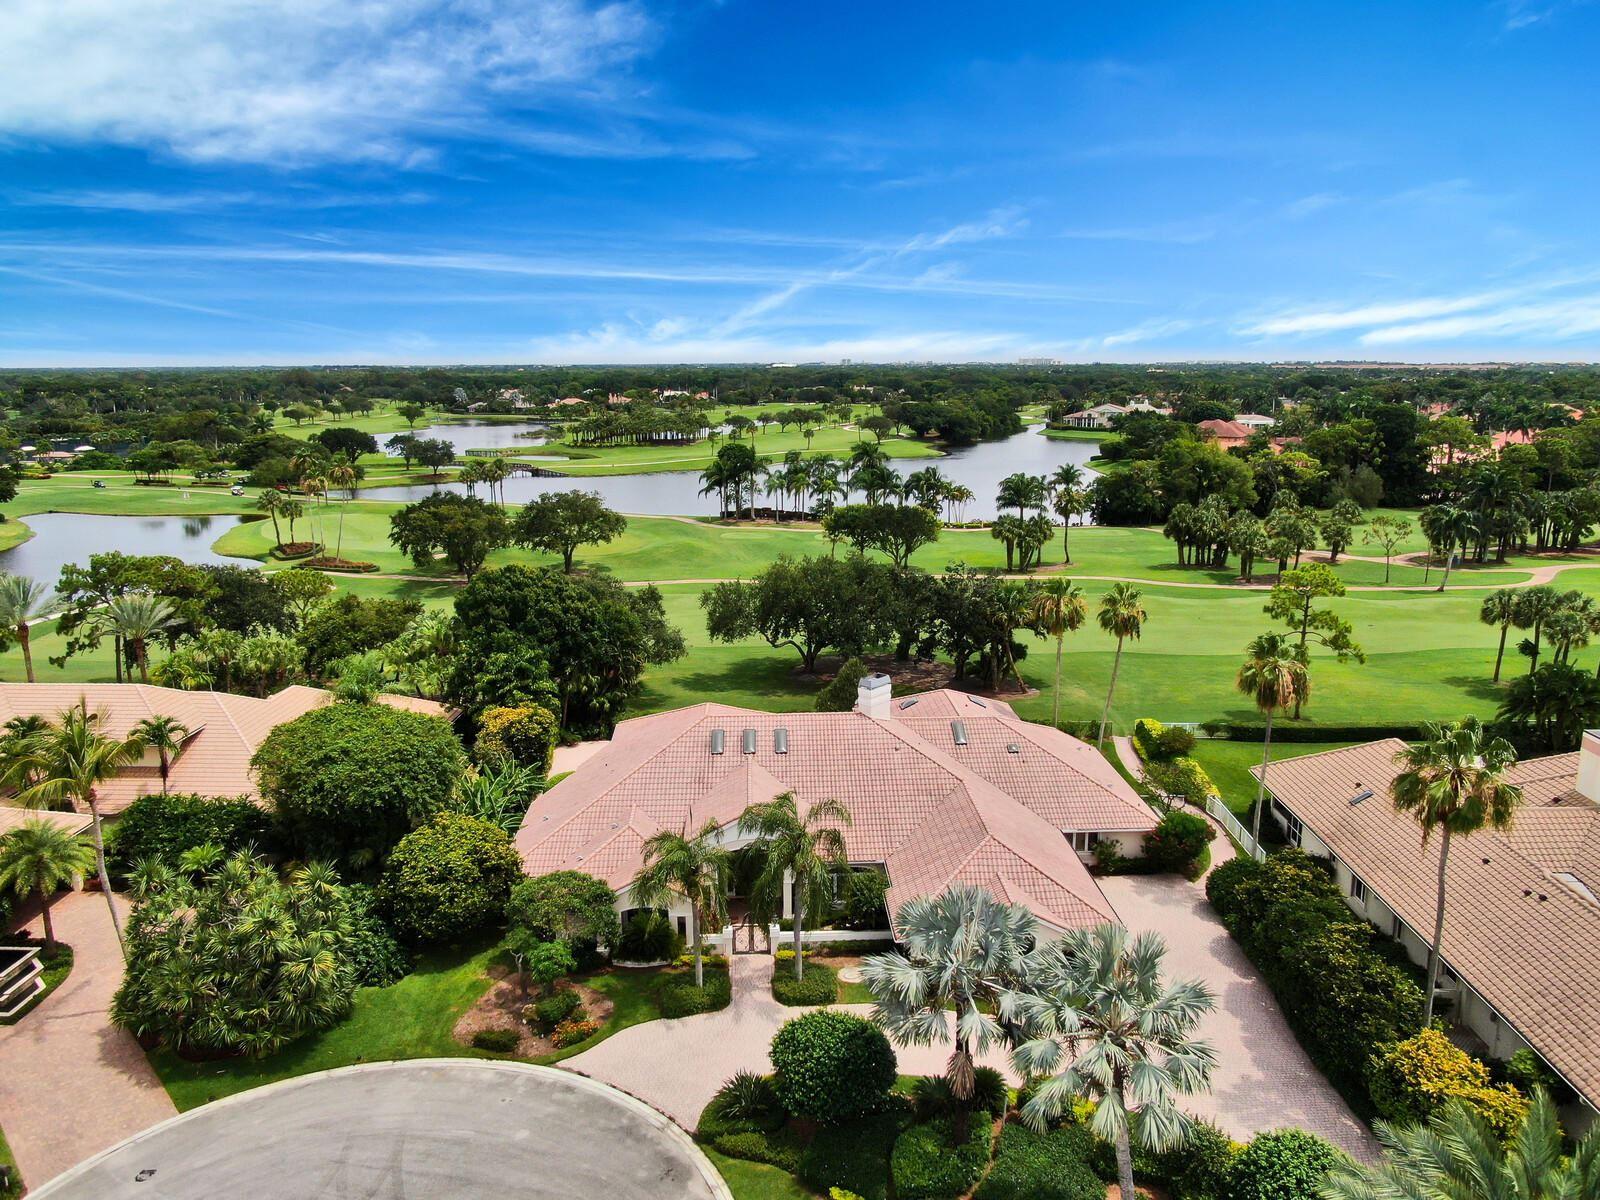 Photo of 3221 Burgundy Drive N, Palm Beach Gardens, FL 33410 (MLS # RX-10628923)